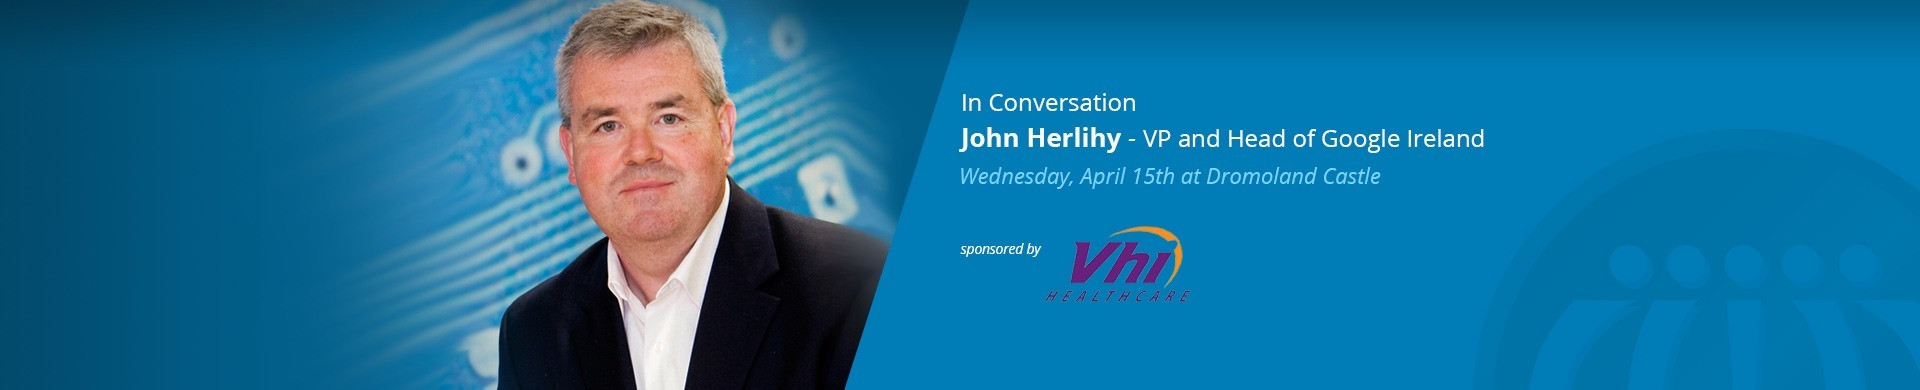 John Herlihy, VP and Head of Google Ireland